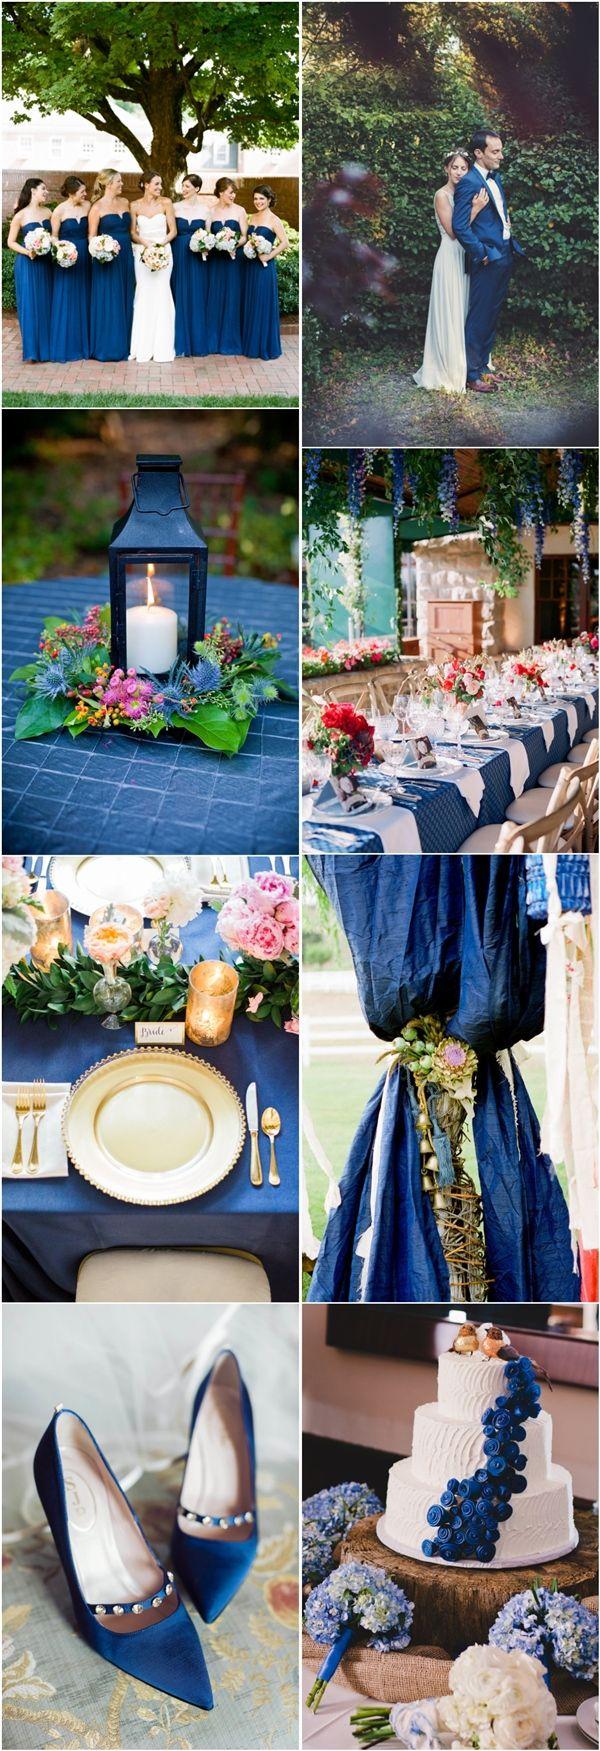 tiffany blue and black wedding decorations%0A    Snorkel Blue Wedding Color Ideas for